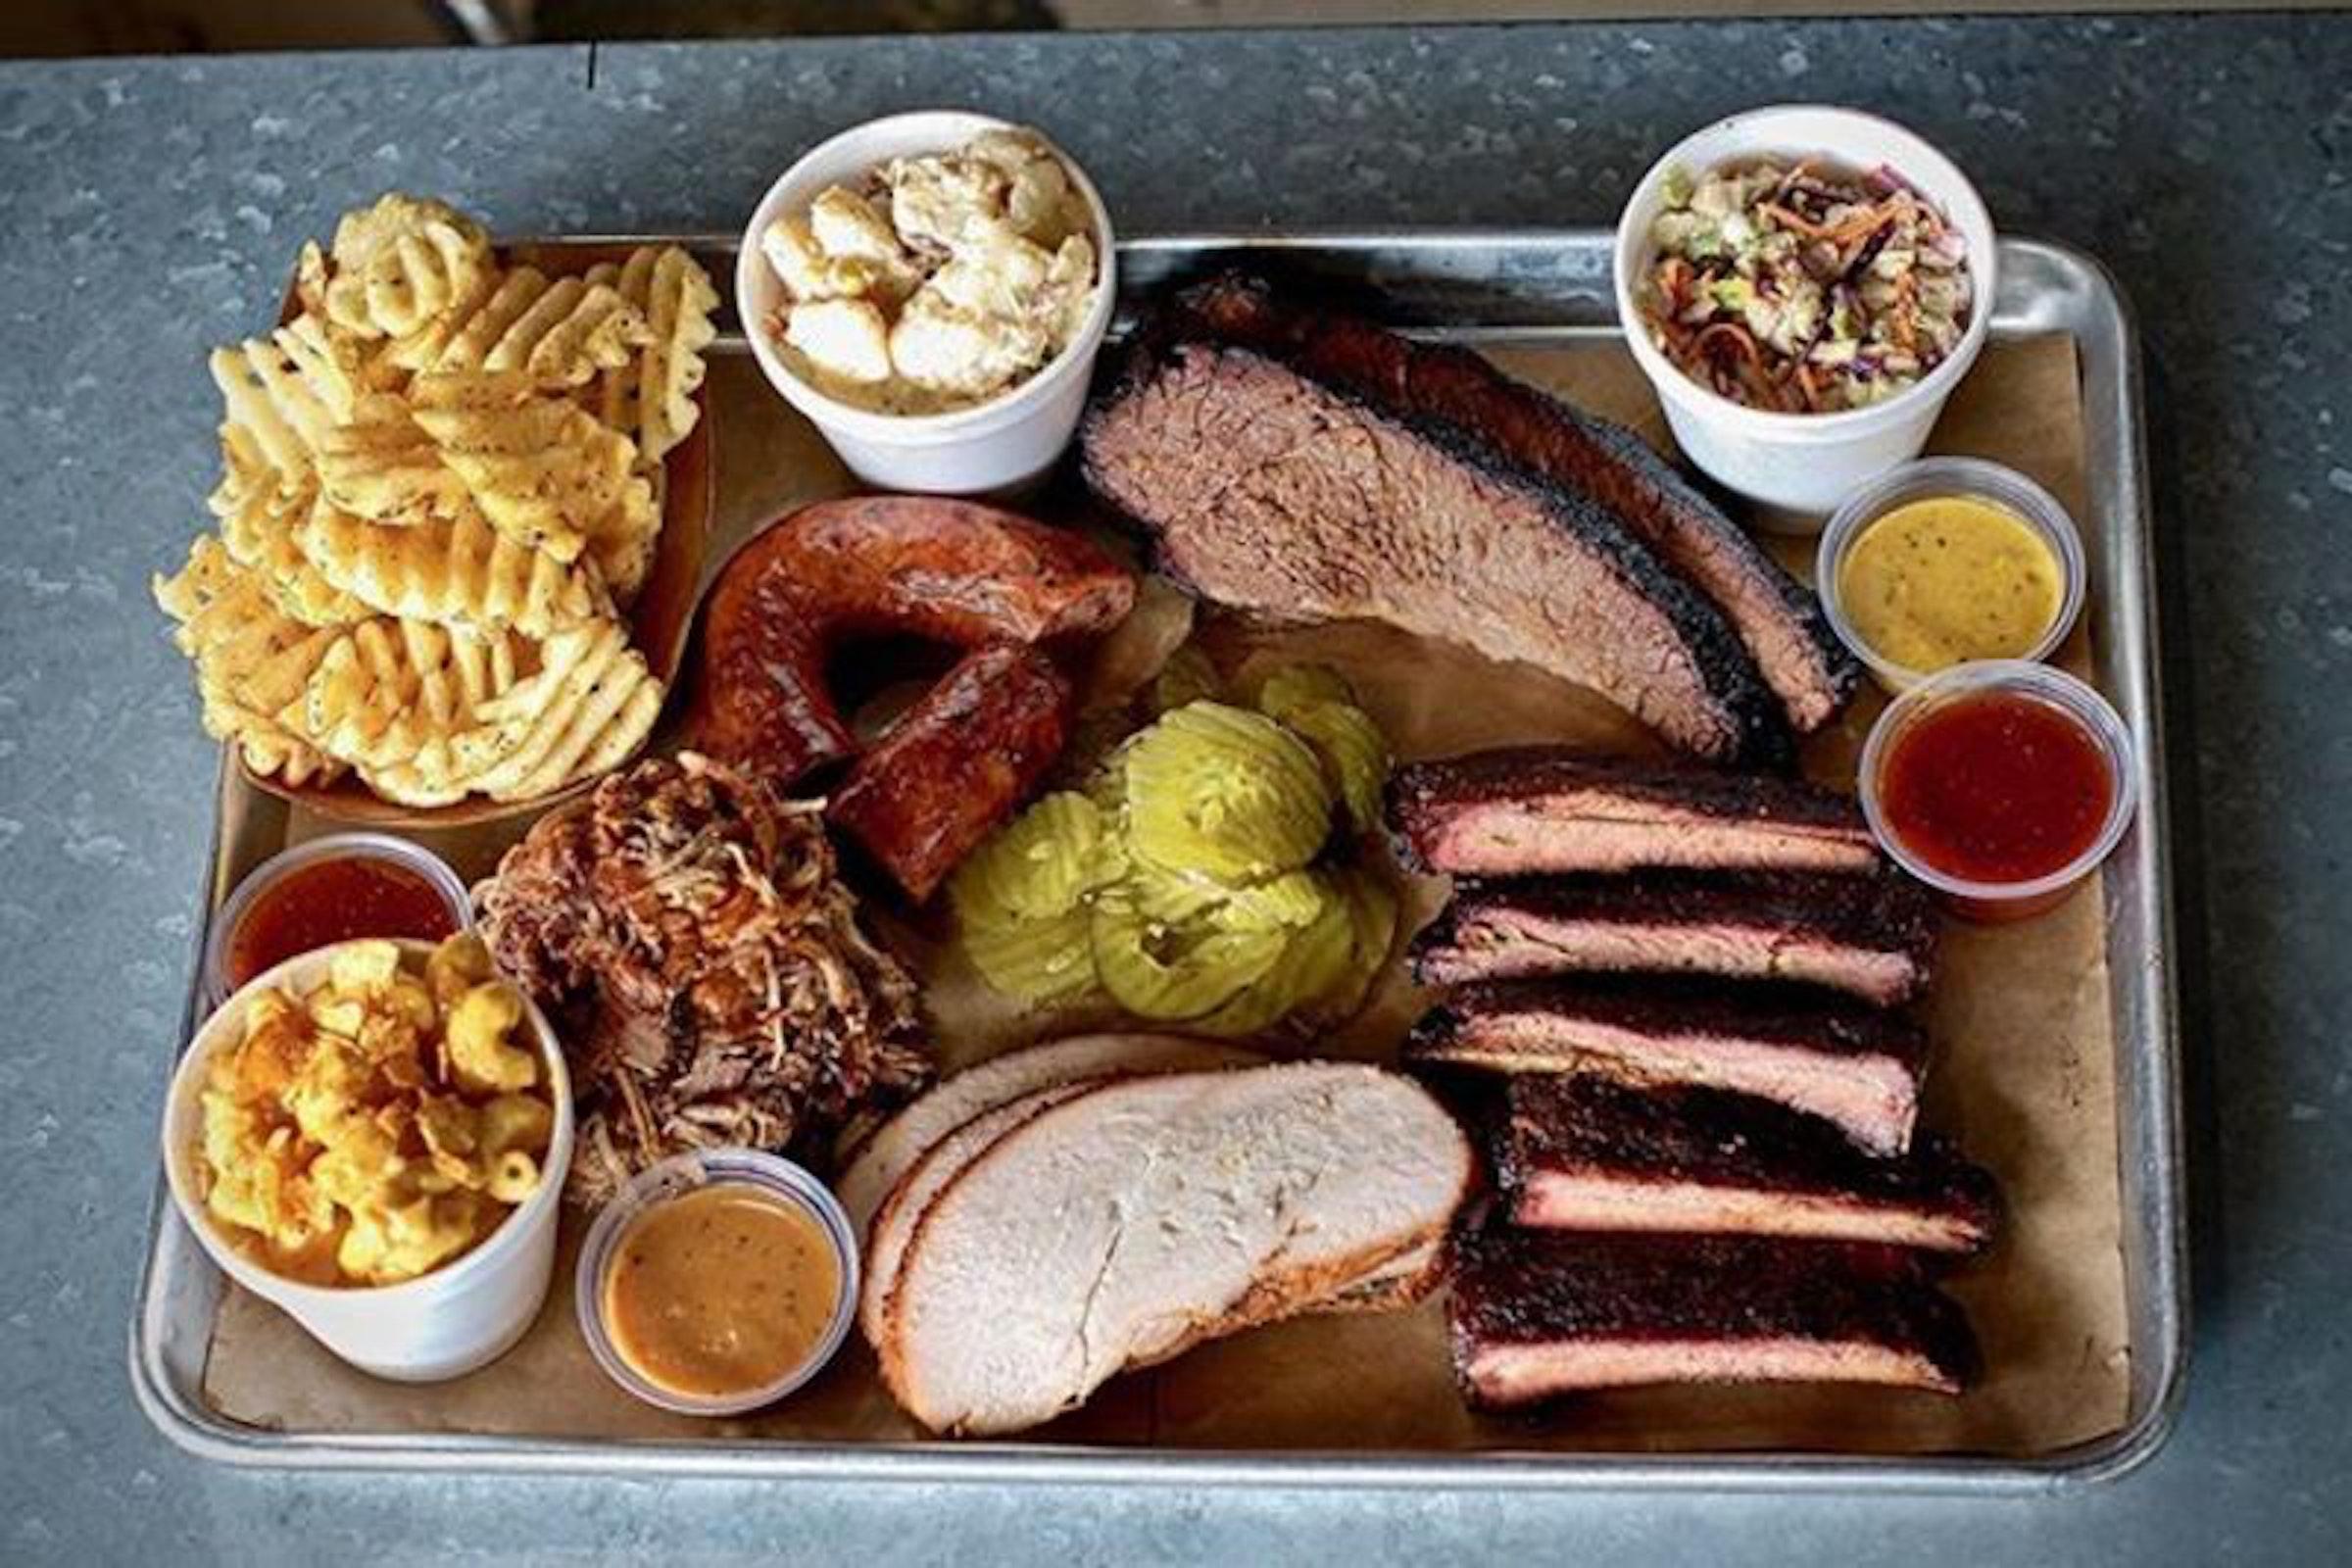 Ferris Wheelers Backyard & BBQ in Beyond Dallas